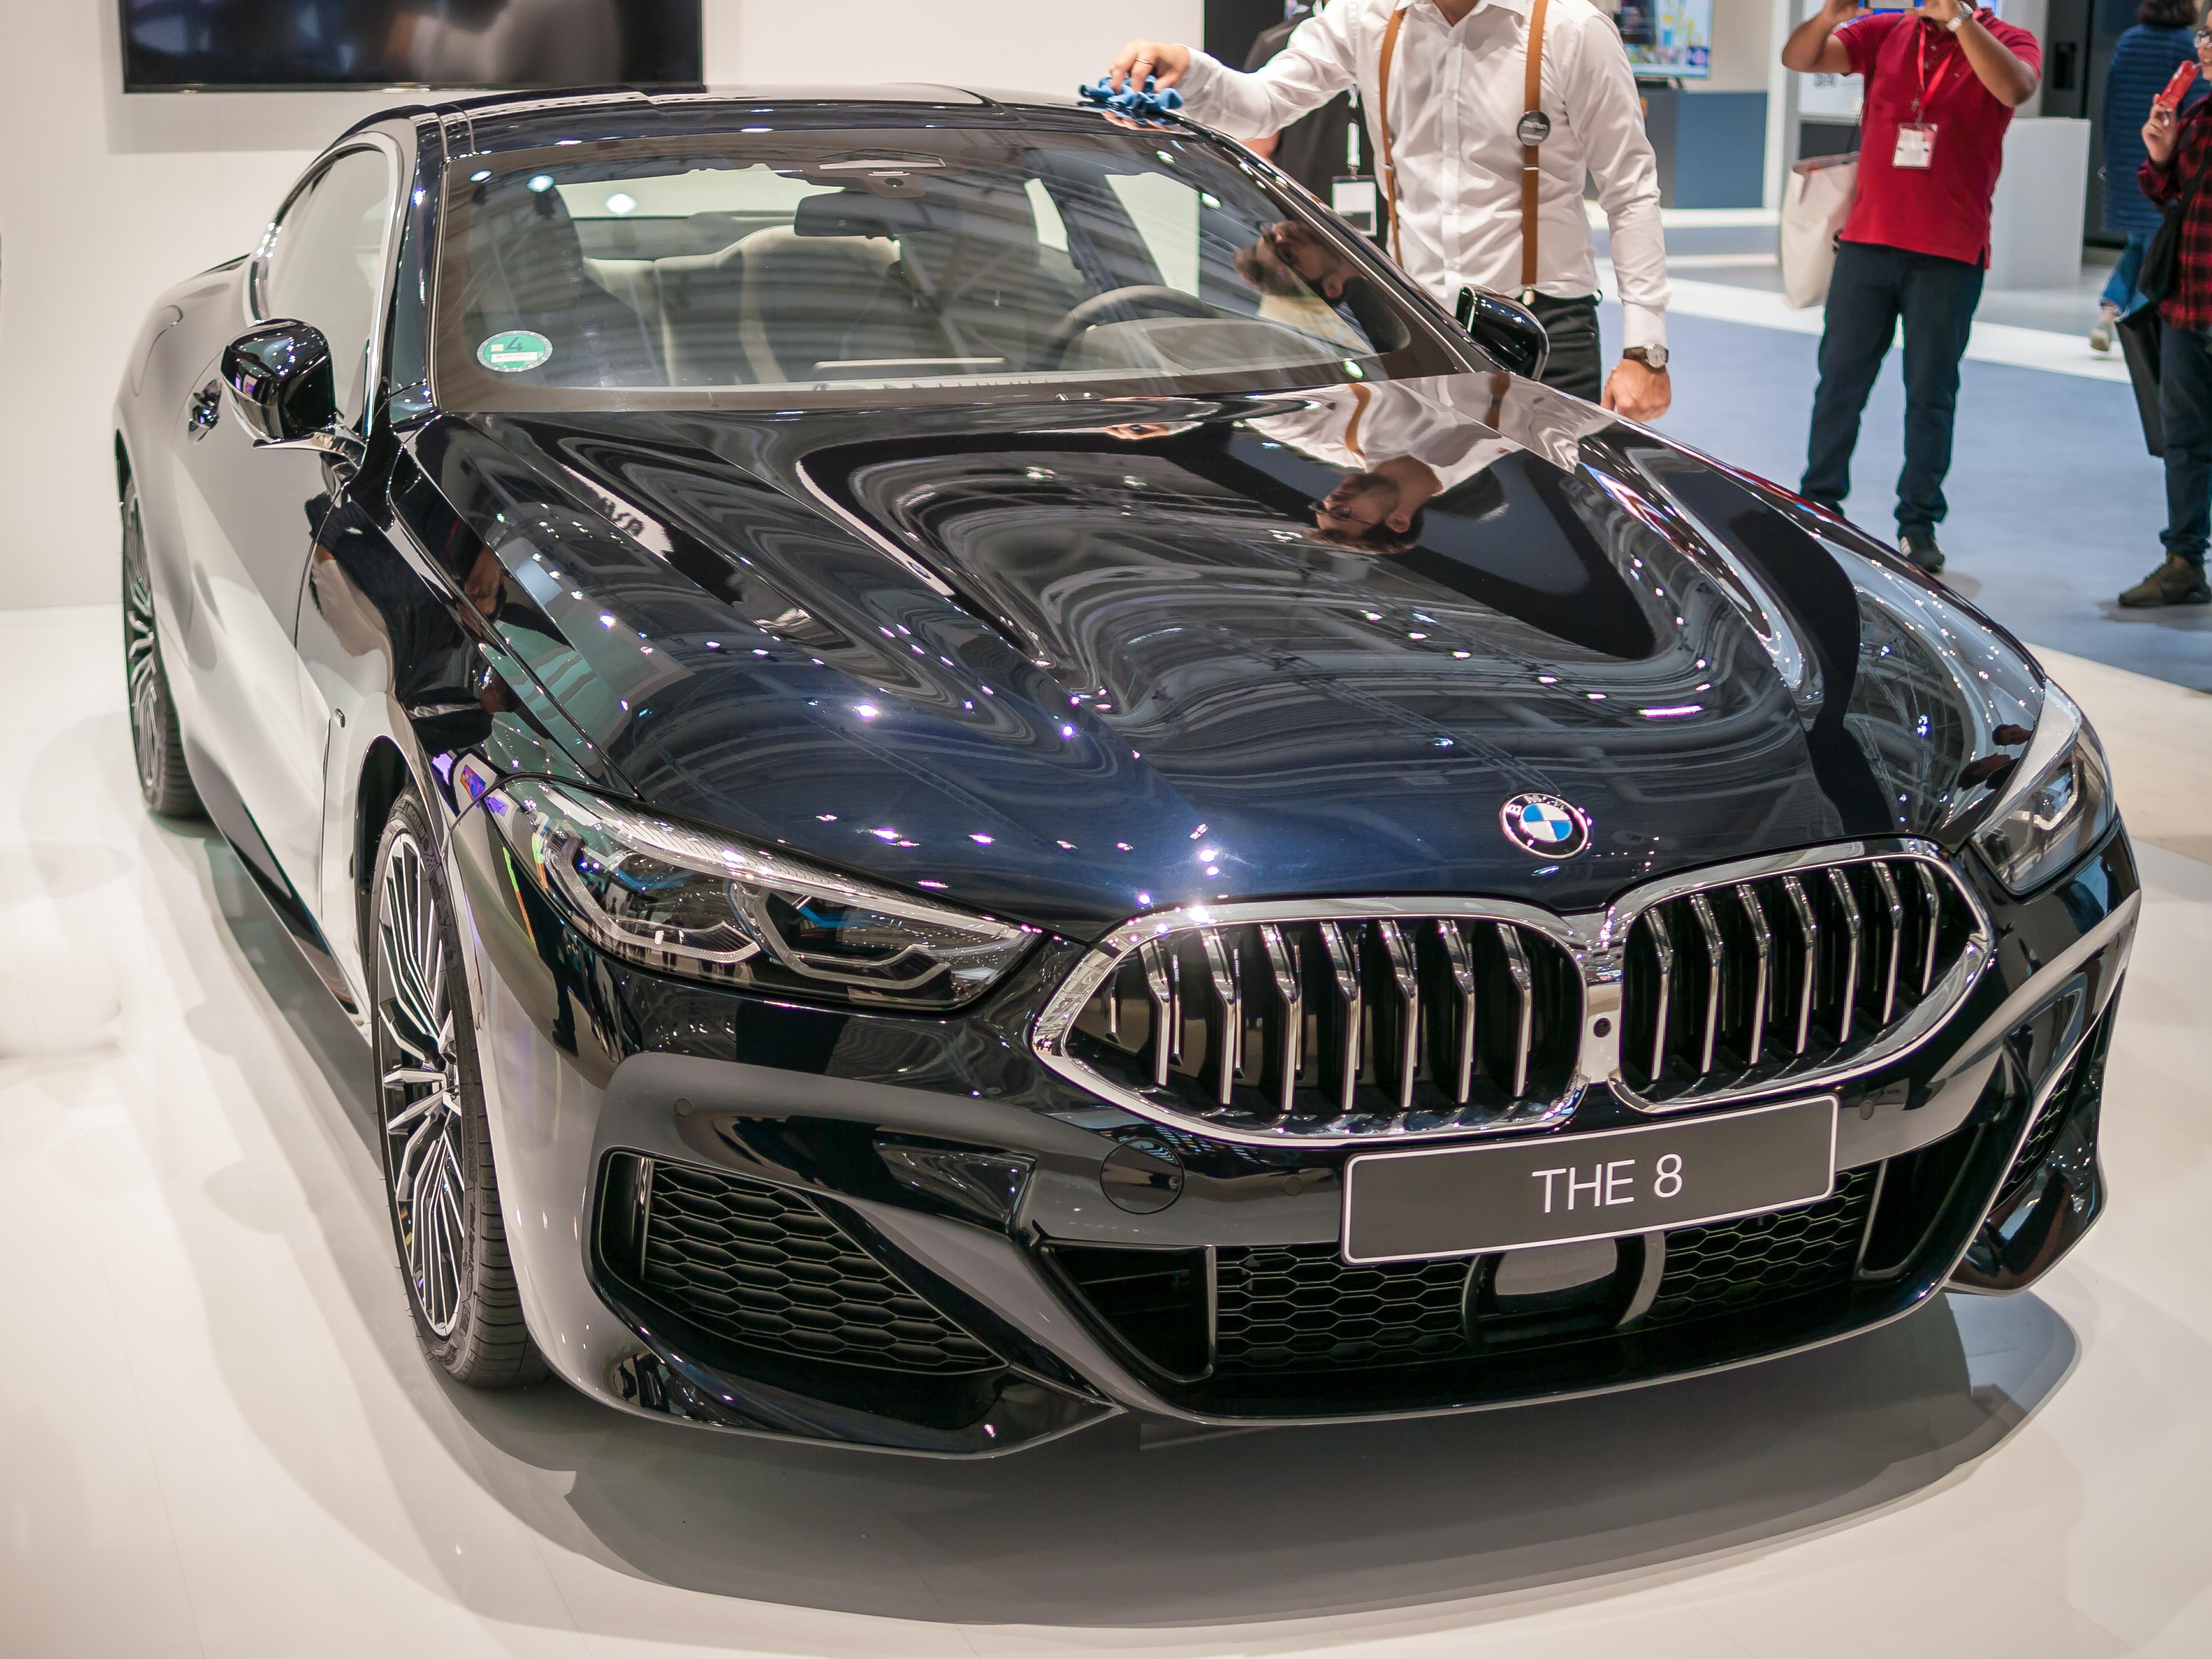 4a76acbfa1c896 File:BMW 840d, IFA 2018, Berlin (P1070297).jpg - Wikimedia Commons